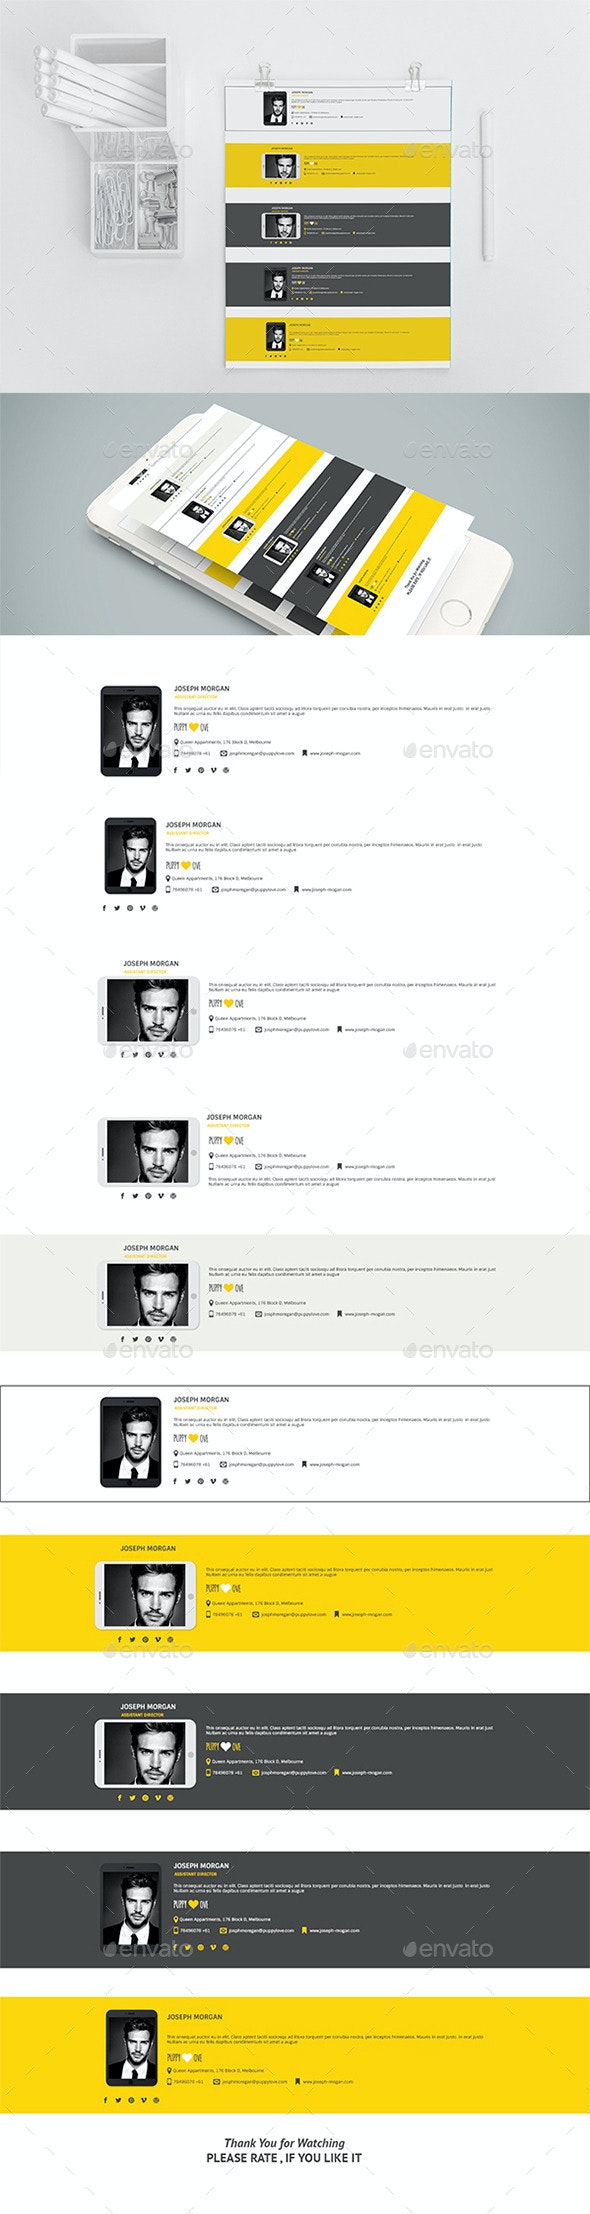 10 E-Signature PSD Templates - Miscellaneous Social Media